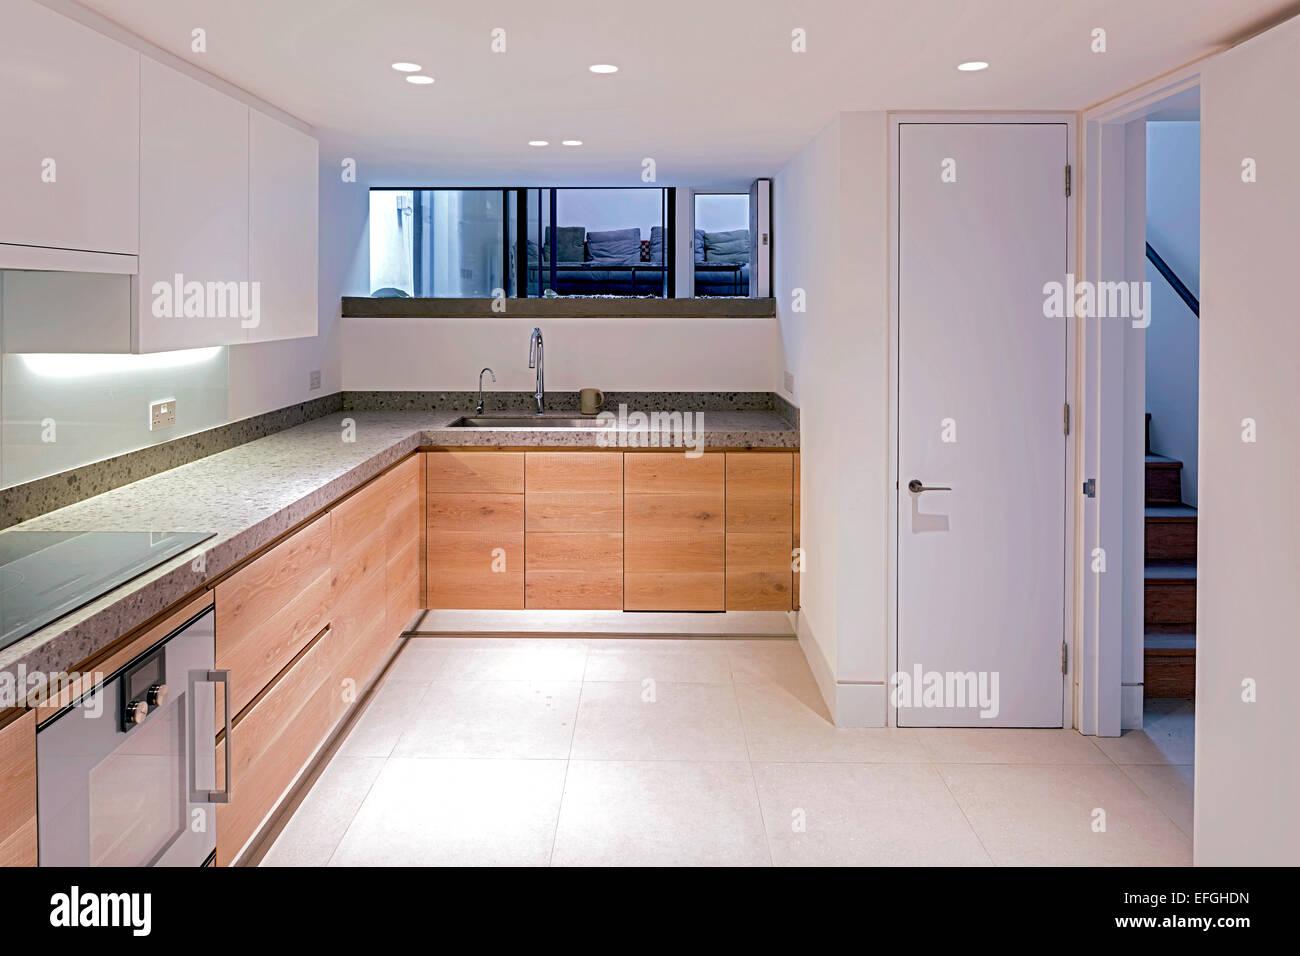 Basement Kitchen Stockfotos & Basement Kitchen Bilder - Alamy